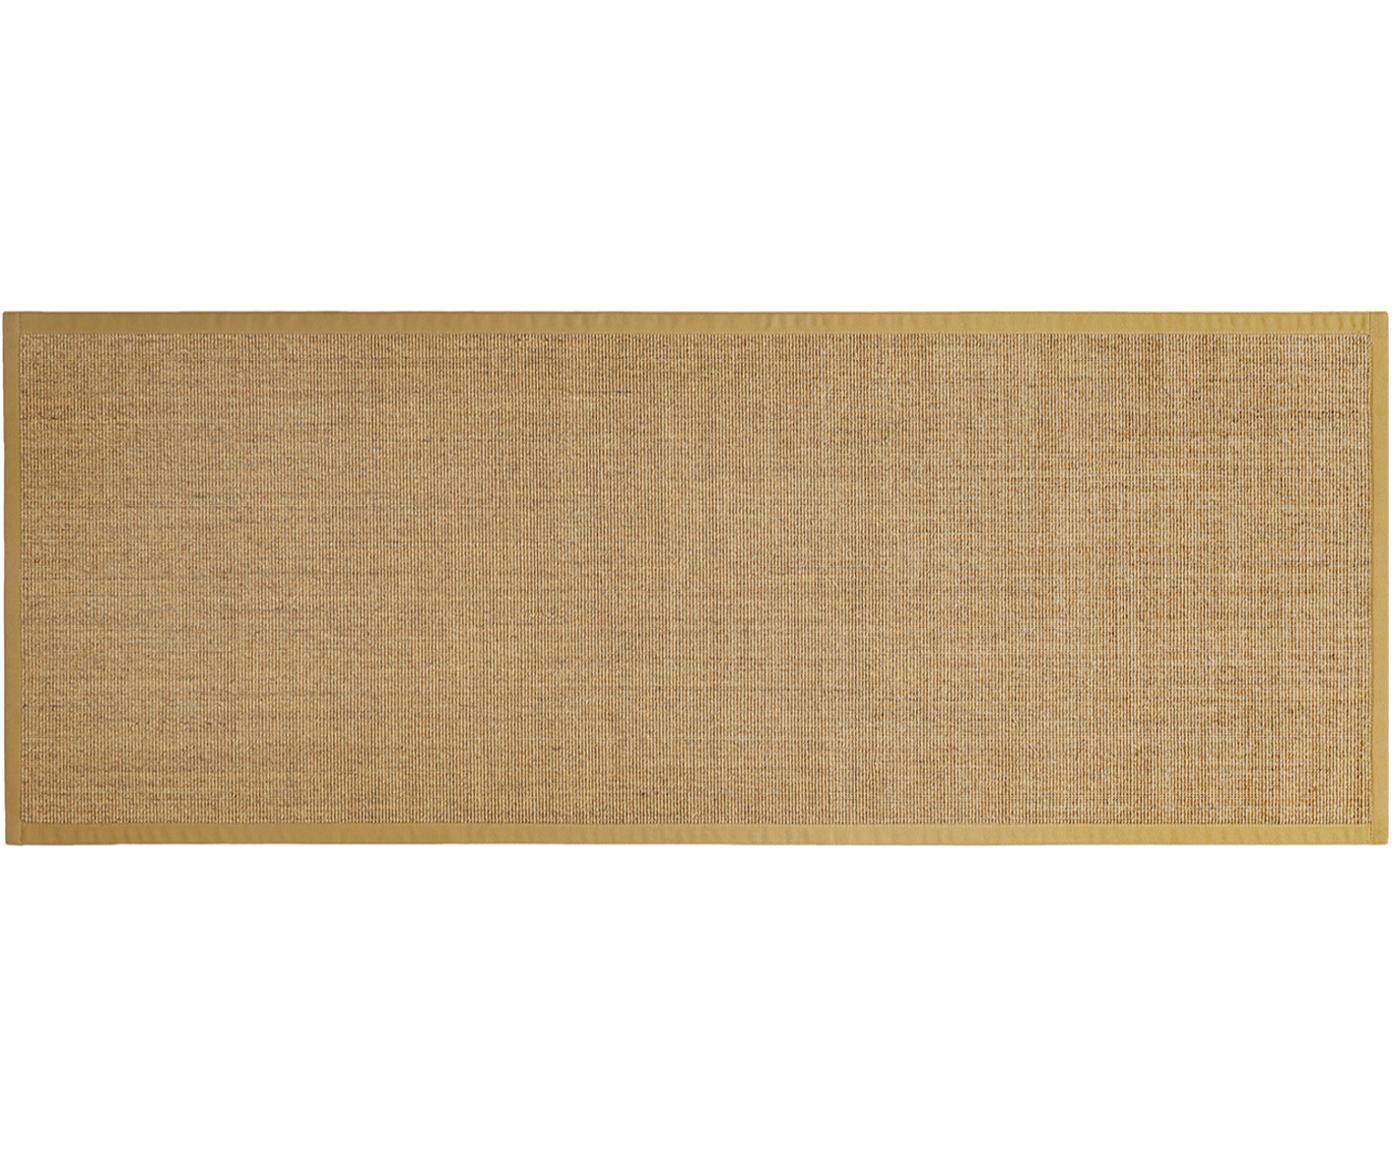 Alfombra Leonie, Fibra de sisal, Beige, An 80 x L 200 cm